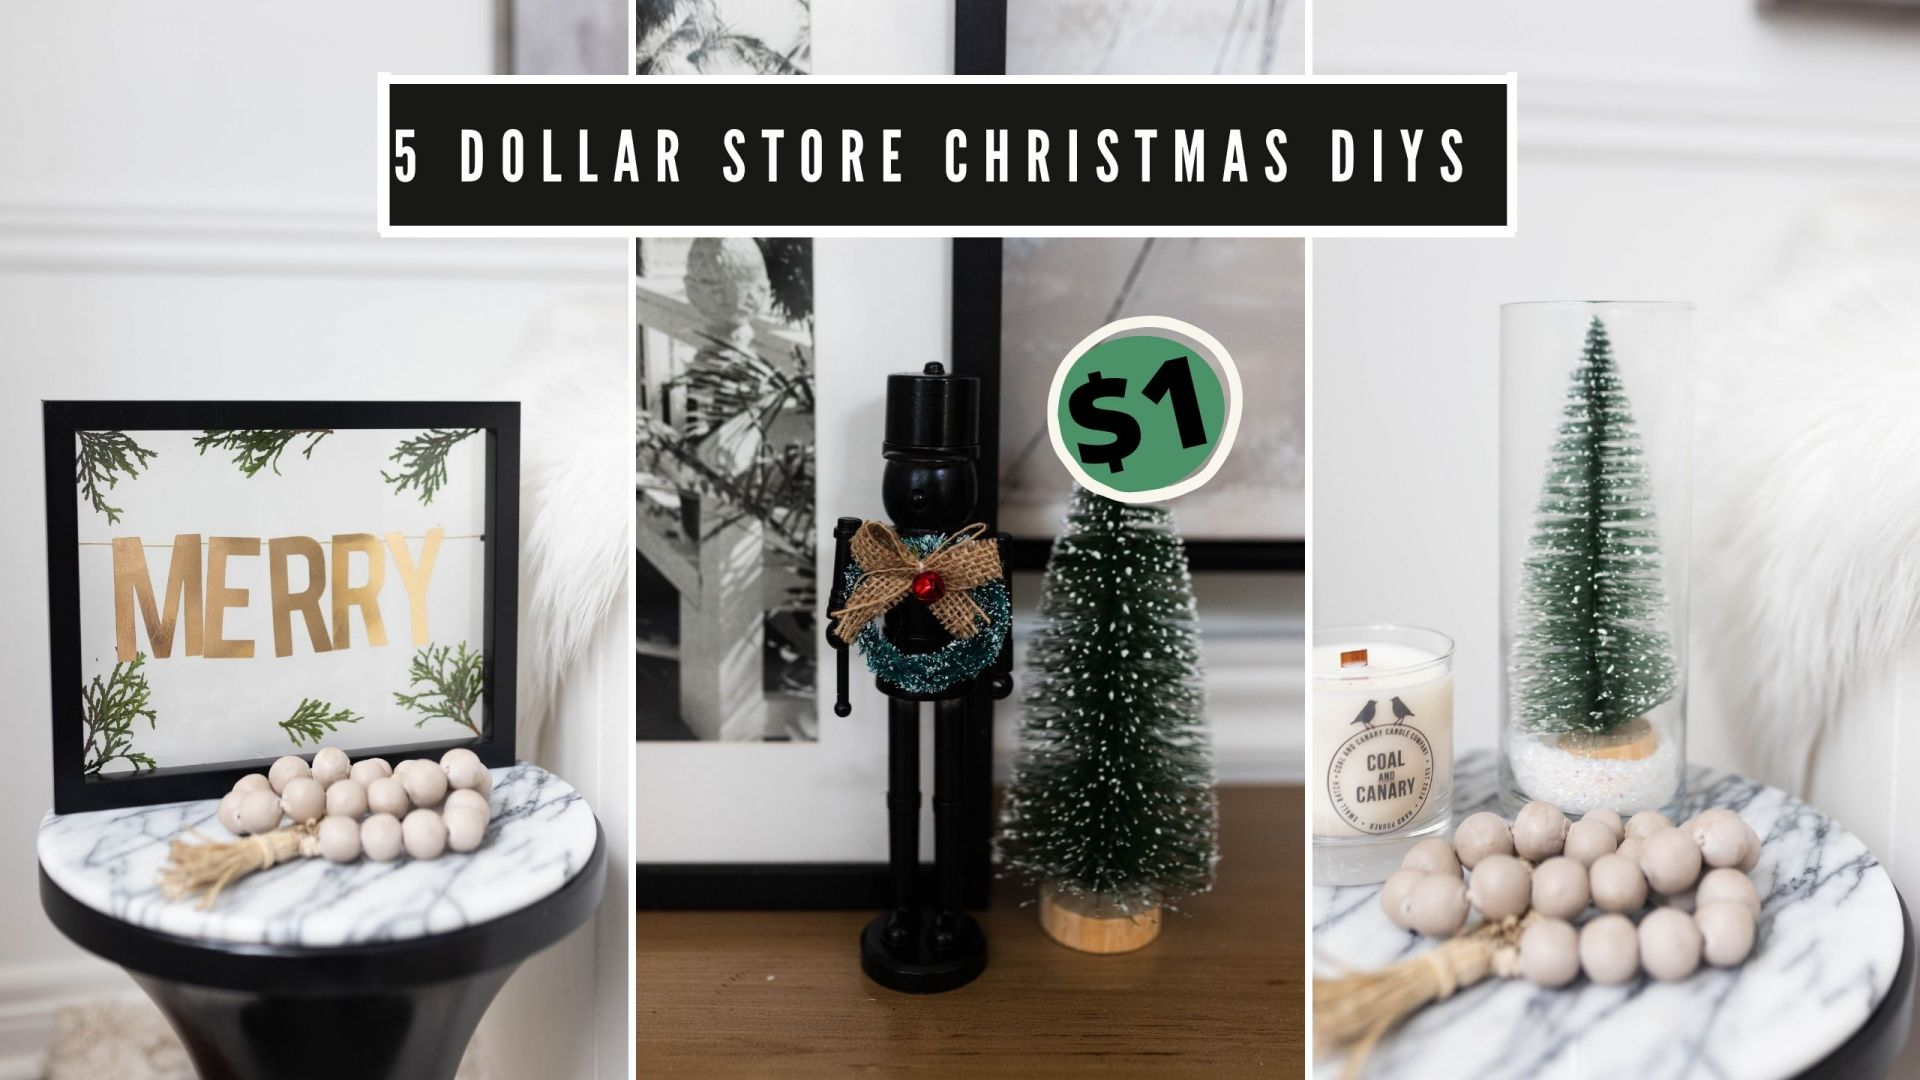 5 Modern DIY Dollar Store Christmas Decor Ideasrn DIY Dollar Store Christmas Decor Ideas